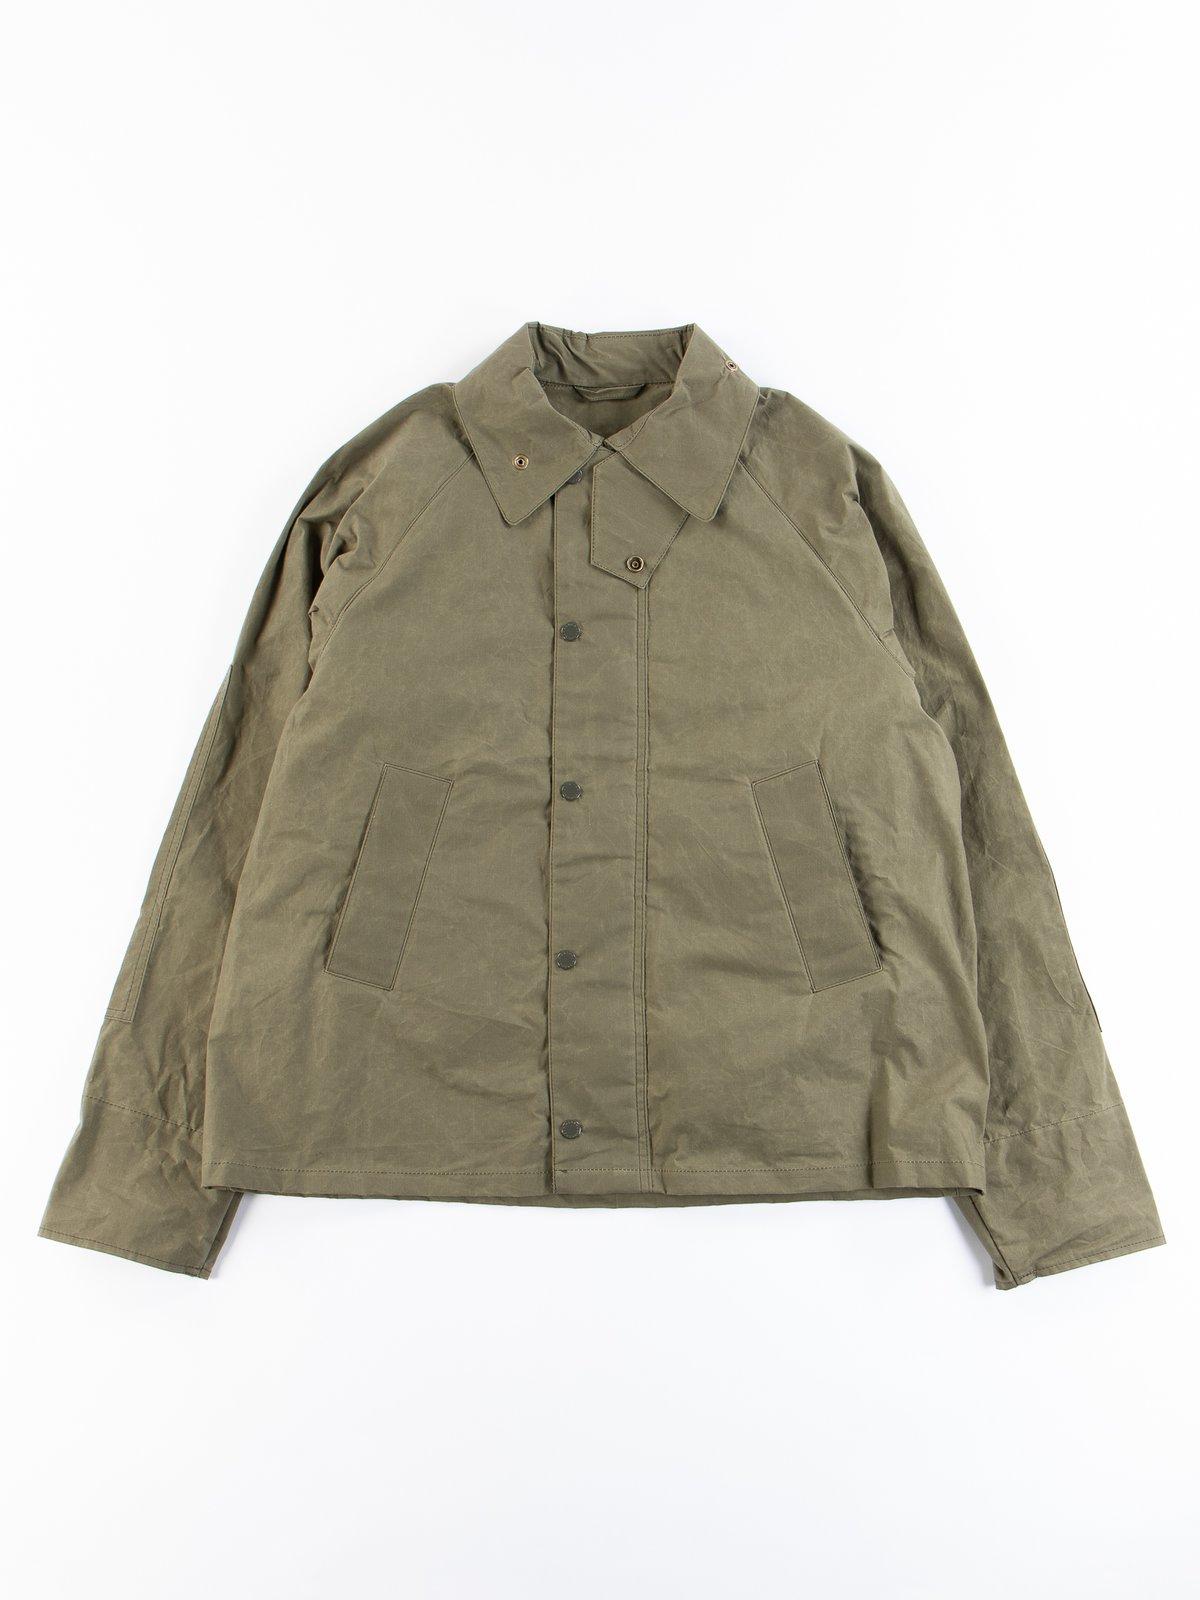 Olive Unlined Graham Jacket - Image 1